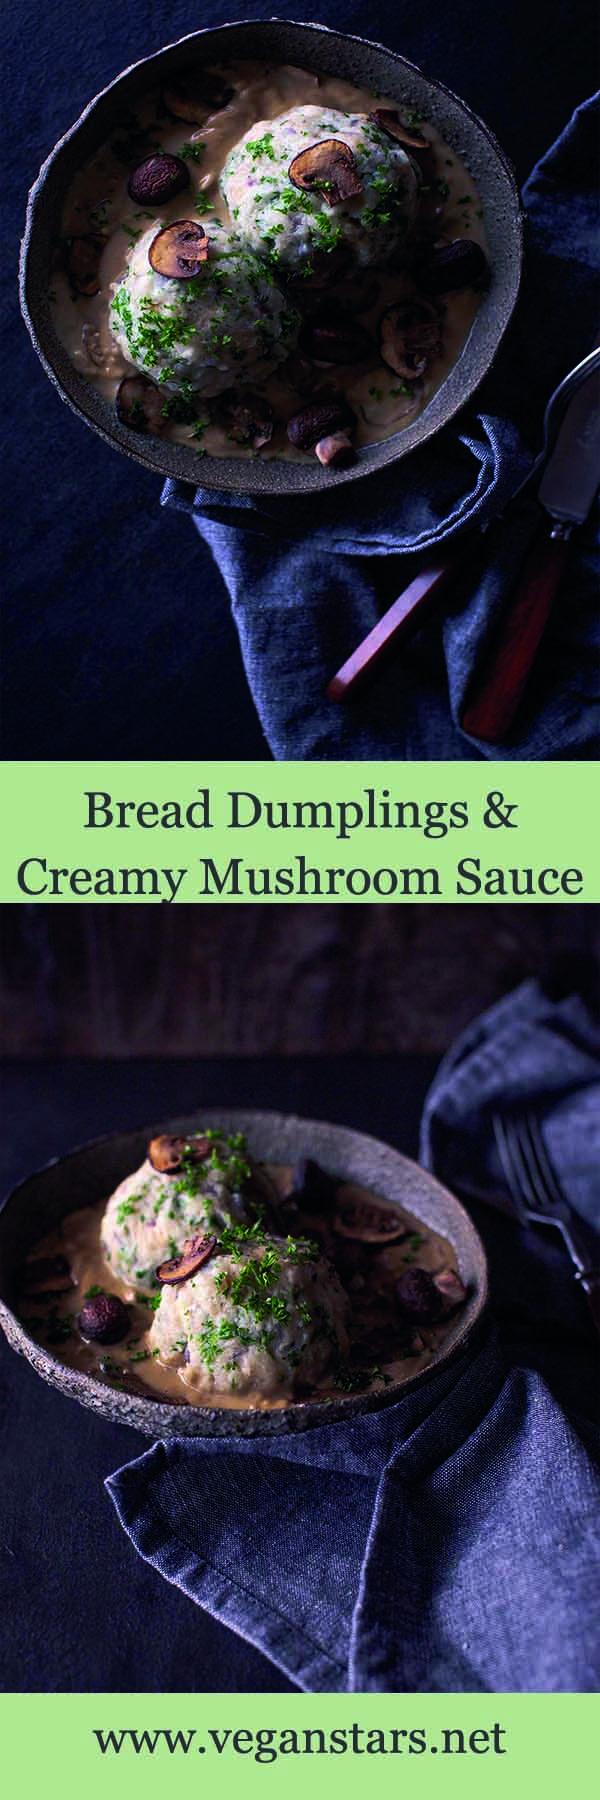 Bread dumplings with Creamy Mushroom Sauce